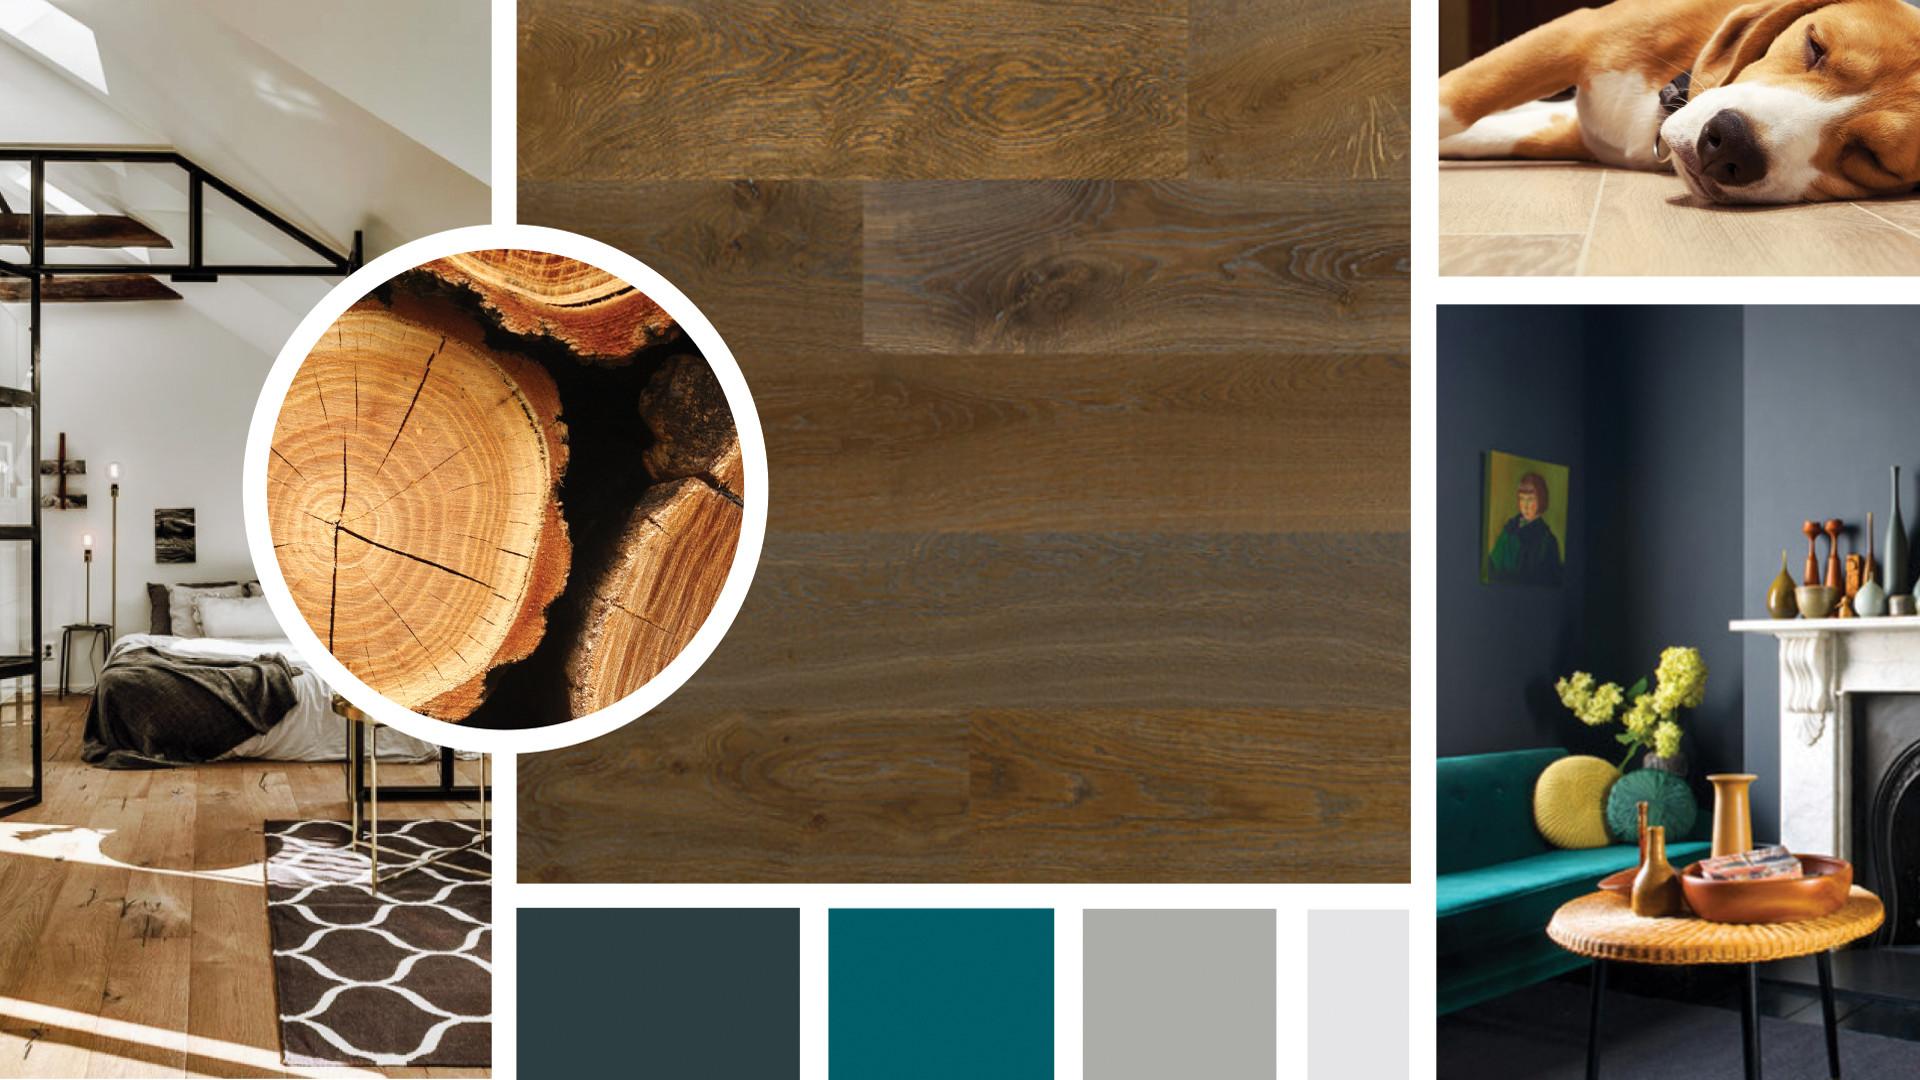 best deal hardwood floor moulding of 4 latest hardwood flooring trends of 2018 lauzon flooring pertaining to new hardwood floorings